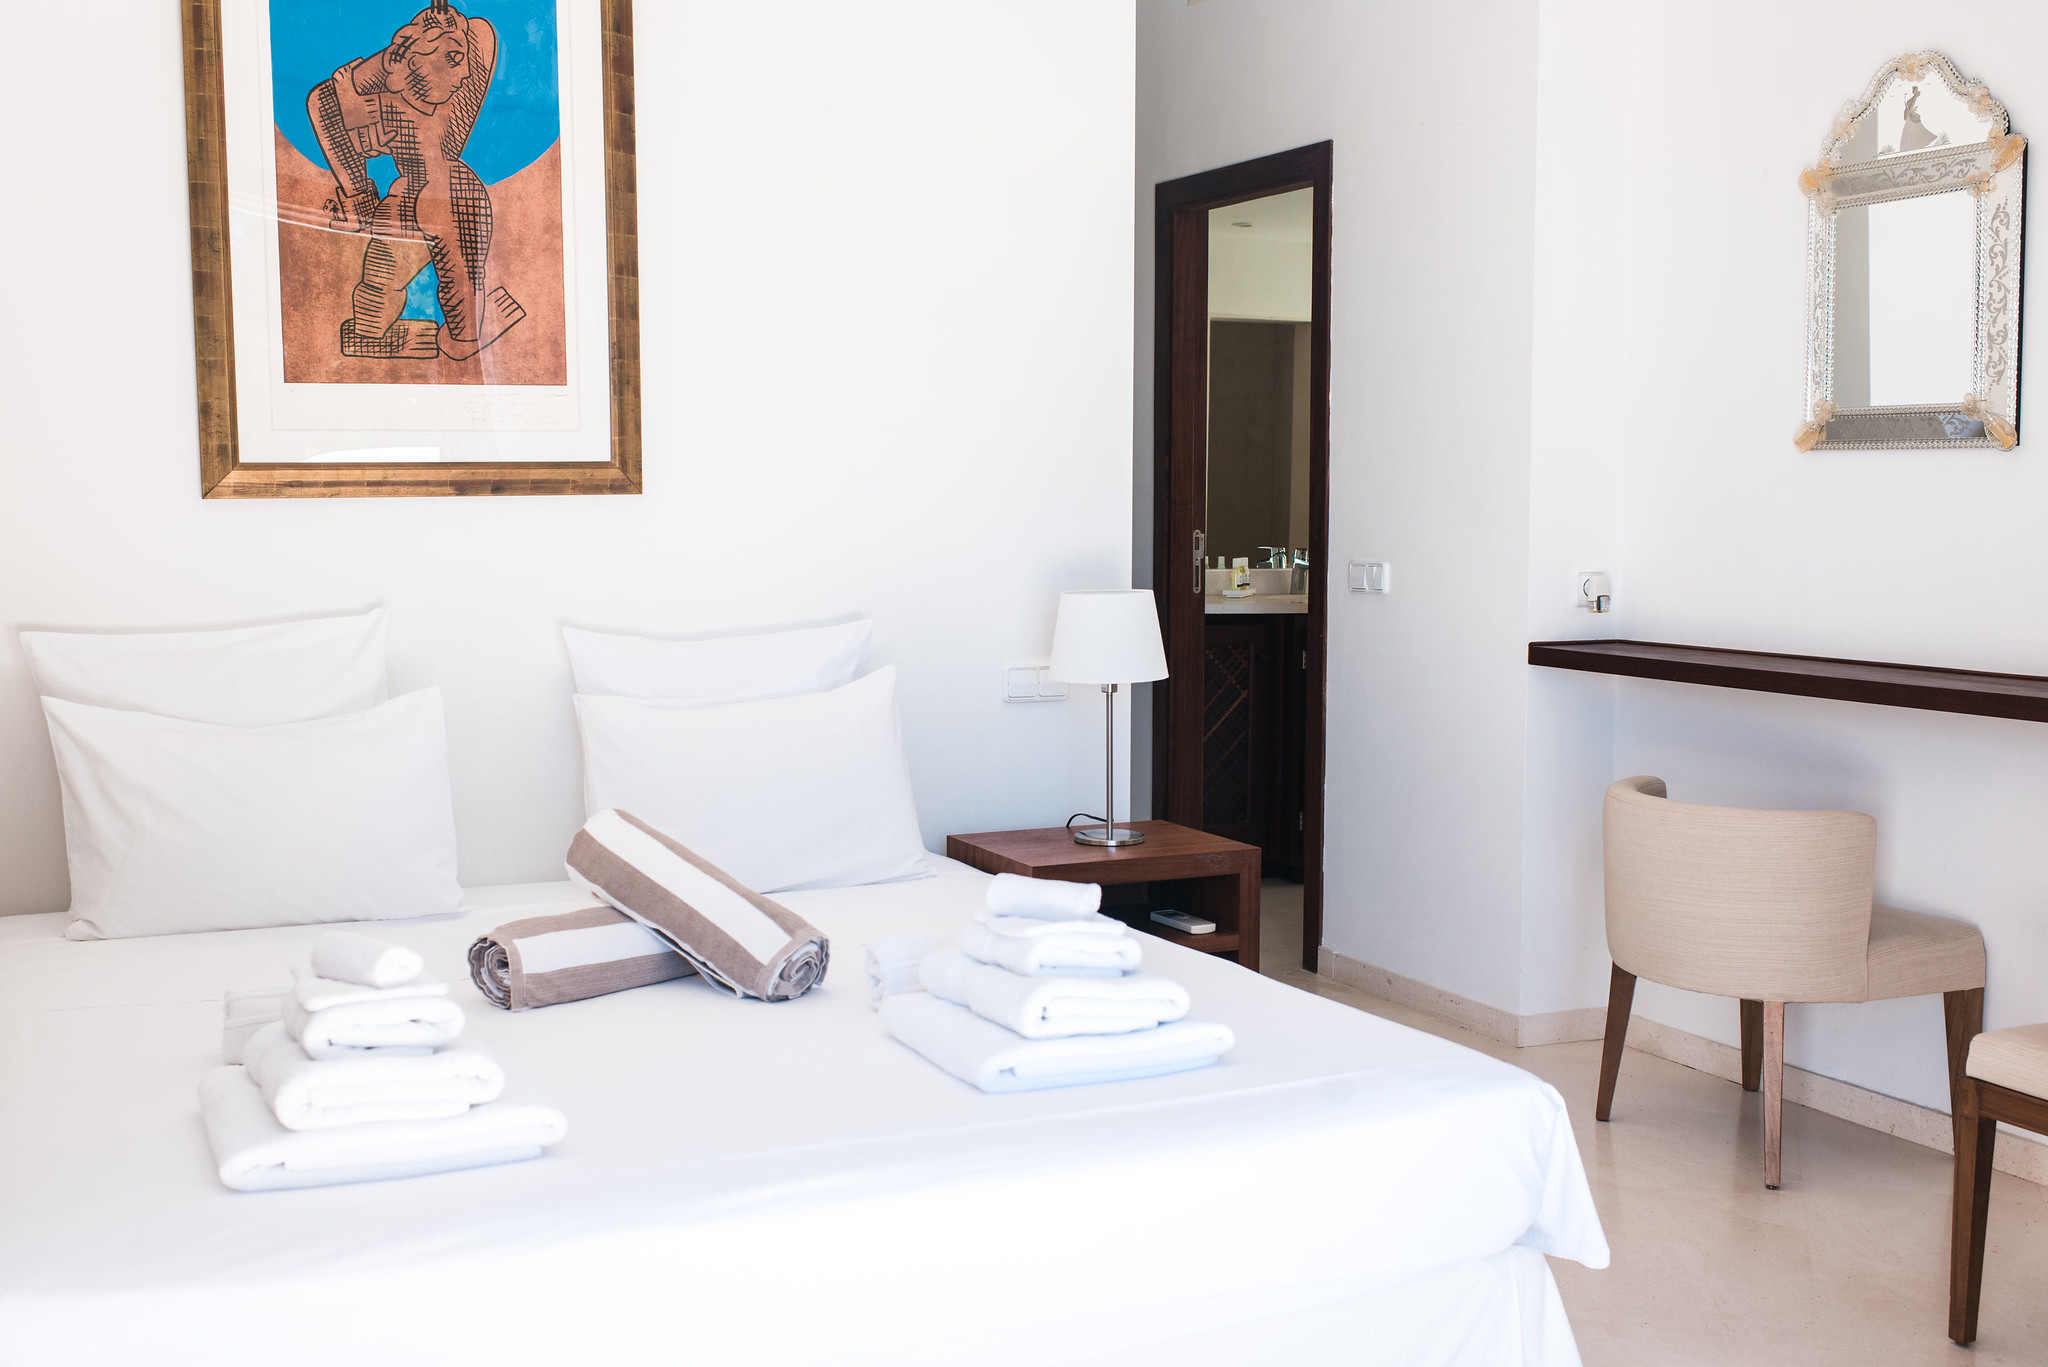 https://www.white-ibiza.com/wp-content/uploads/2020/05/white-ibiza-villas-can-ava-bedroom.jpg